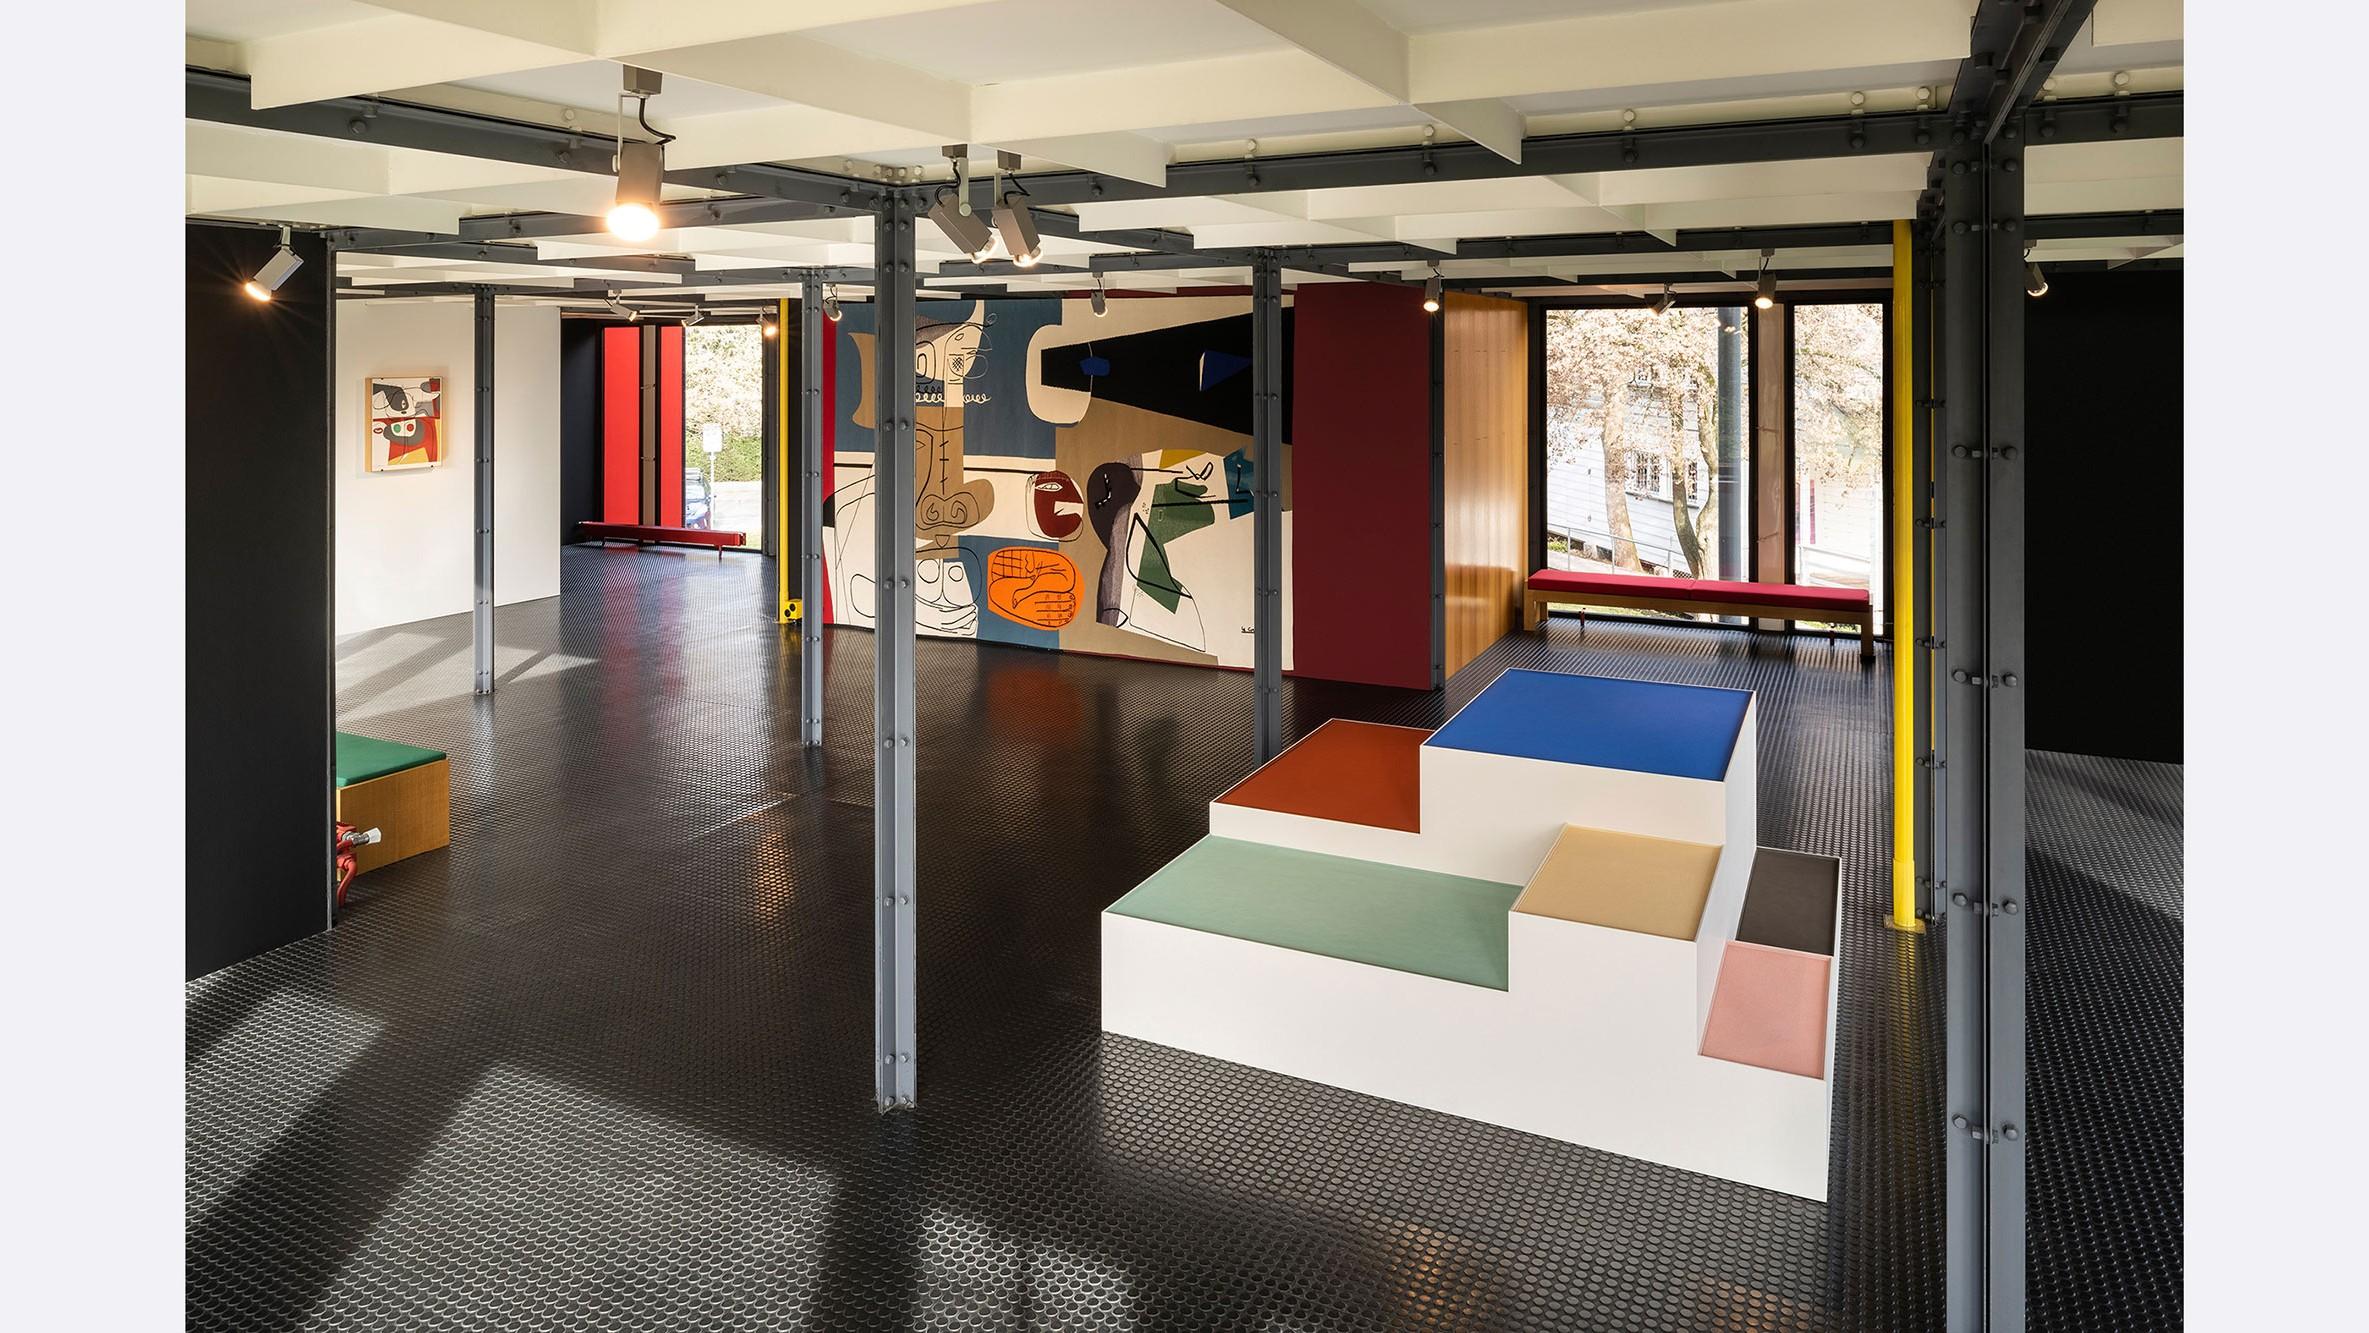 Pavillon Le Corbusier, Ausstellung «Le Corbusier und die Farbe»